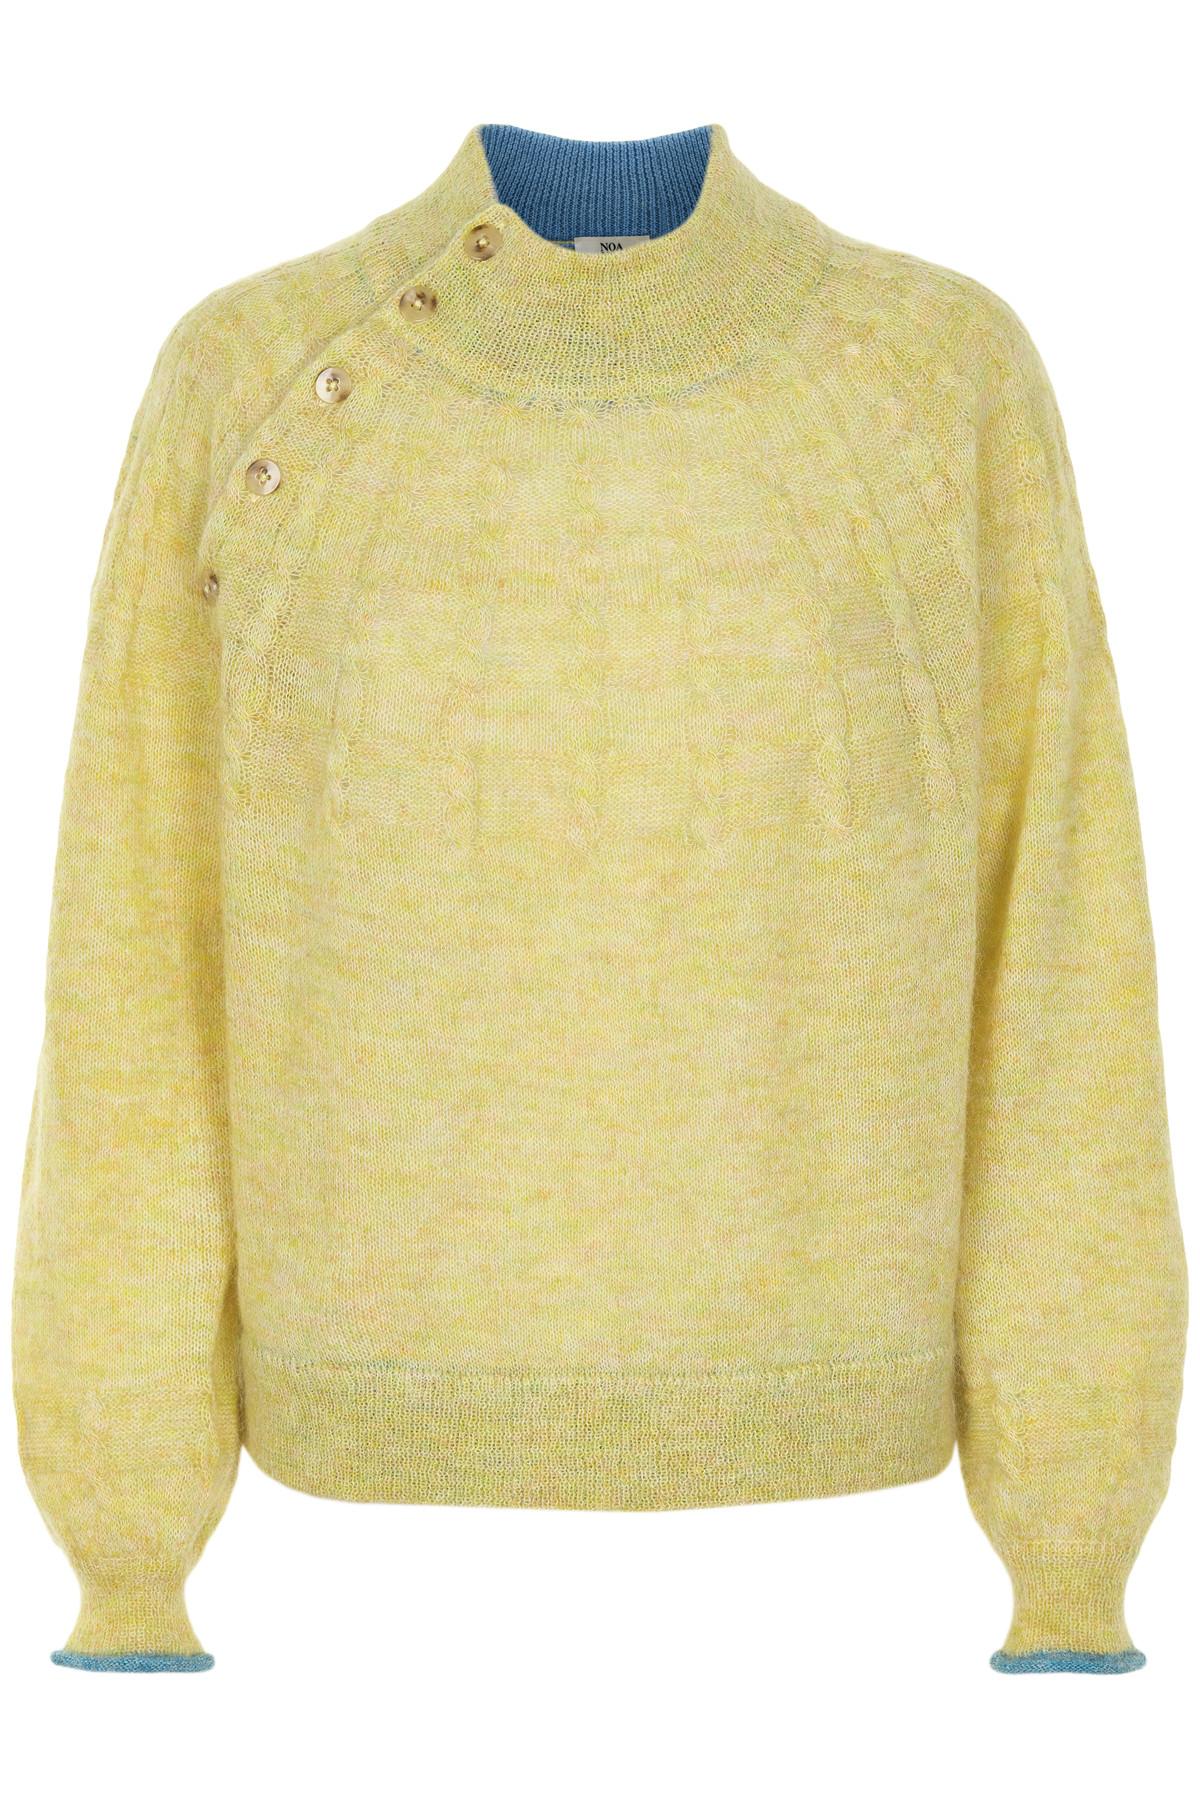 Image of   NOA NOA PULLOVER 1-9614-1 001027 (Yellow, XL)